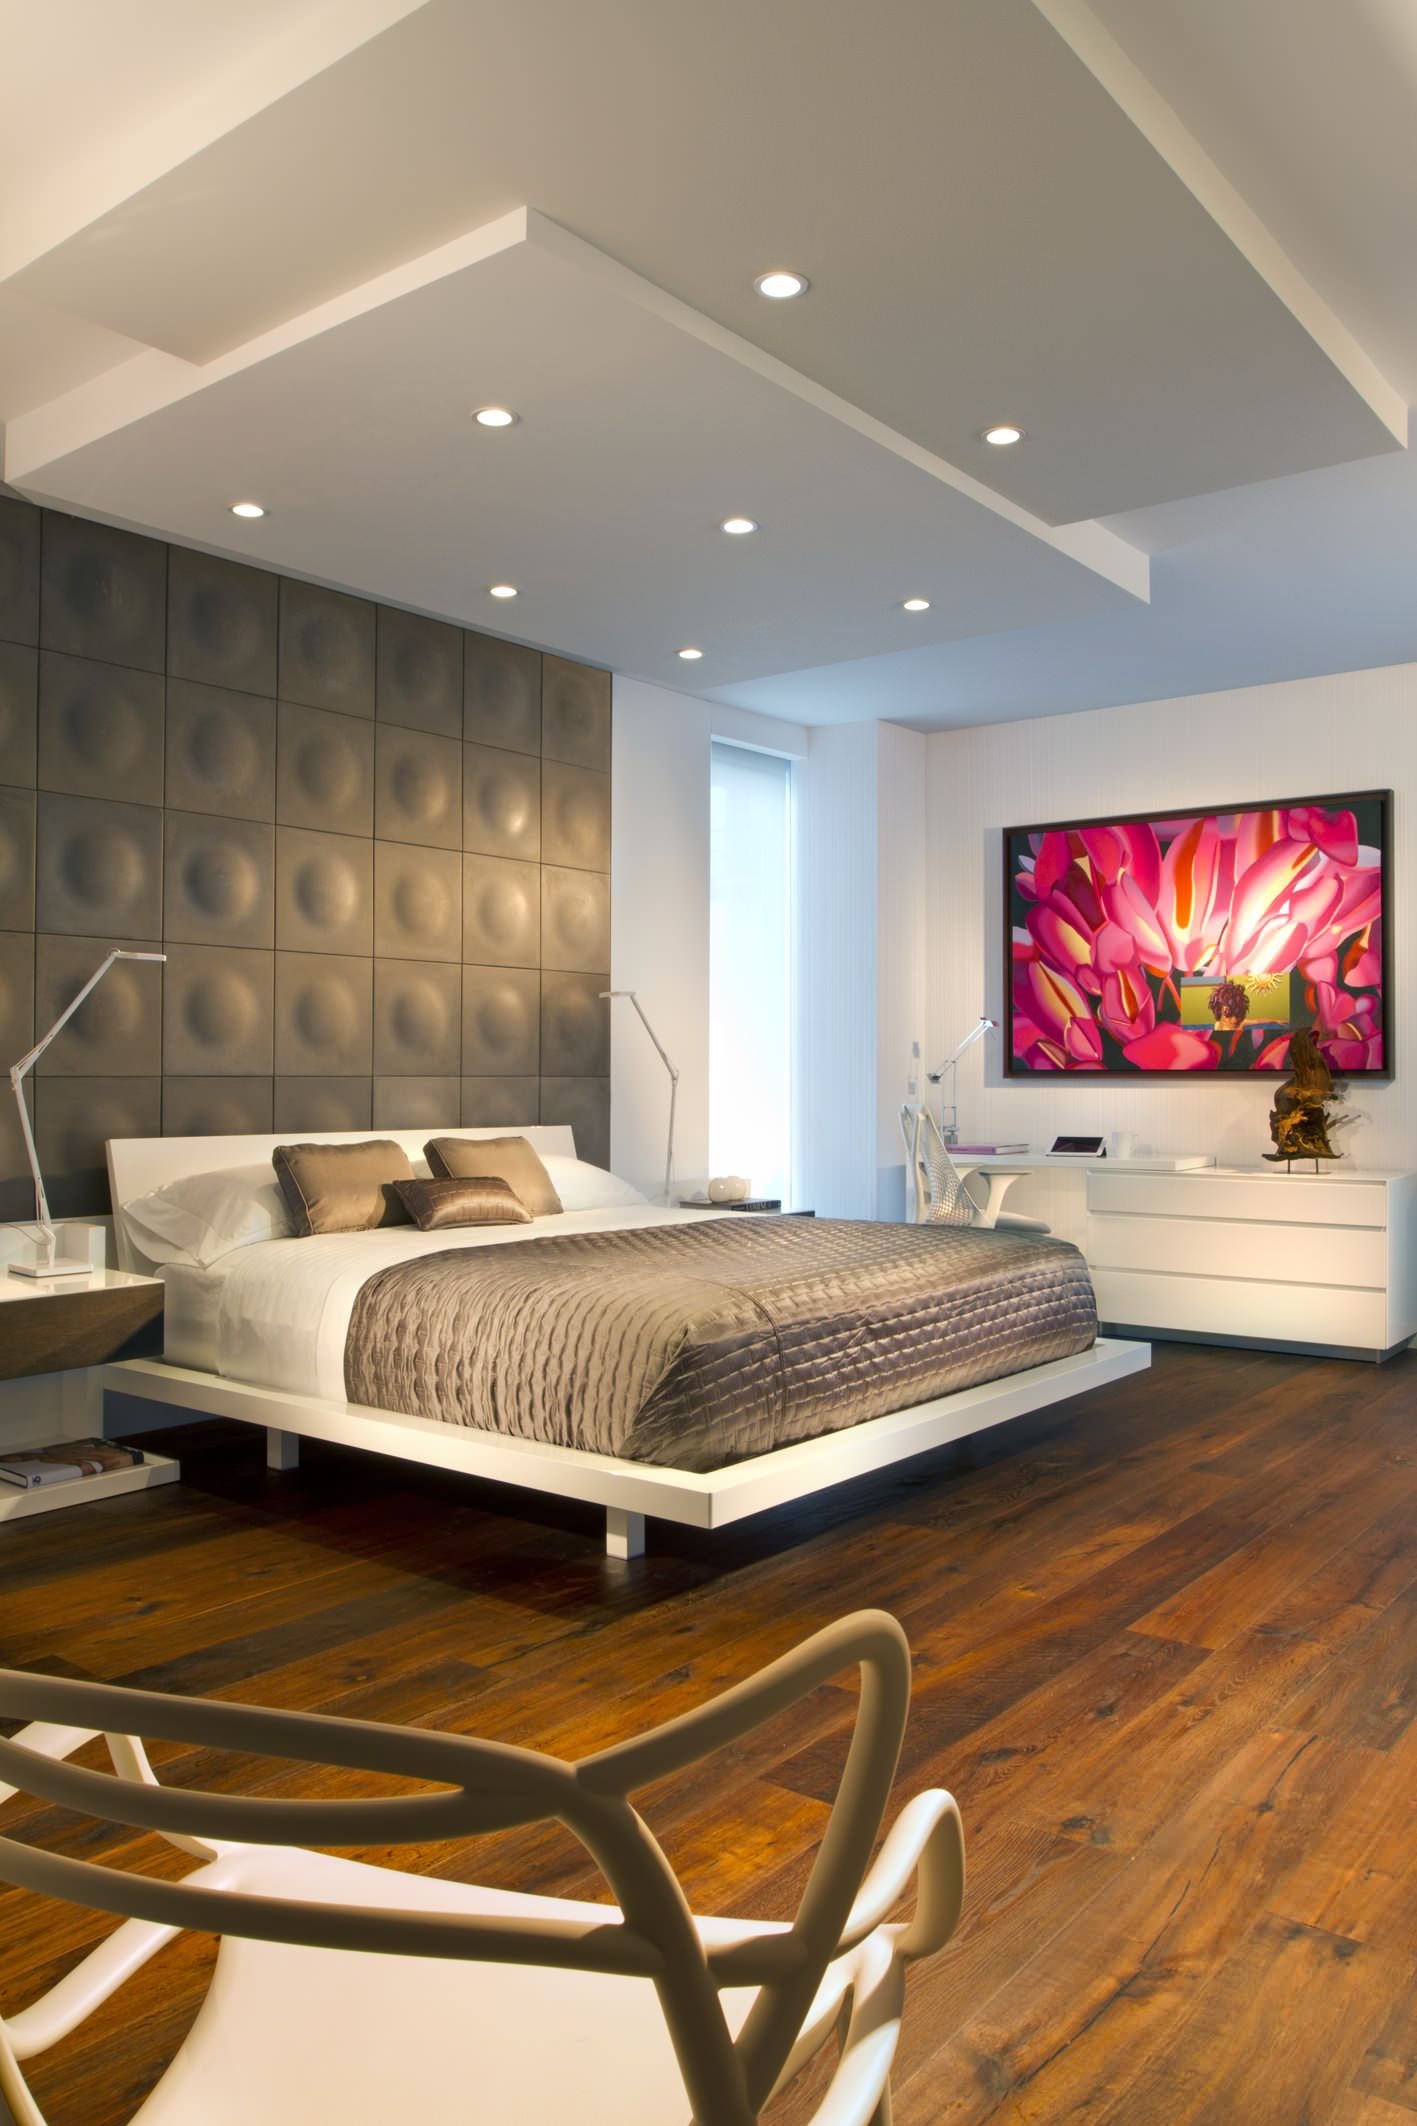 White Bedroom 16 Modern Design Ideas For Your Bedroom